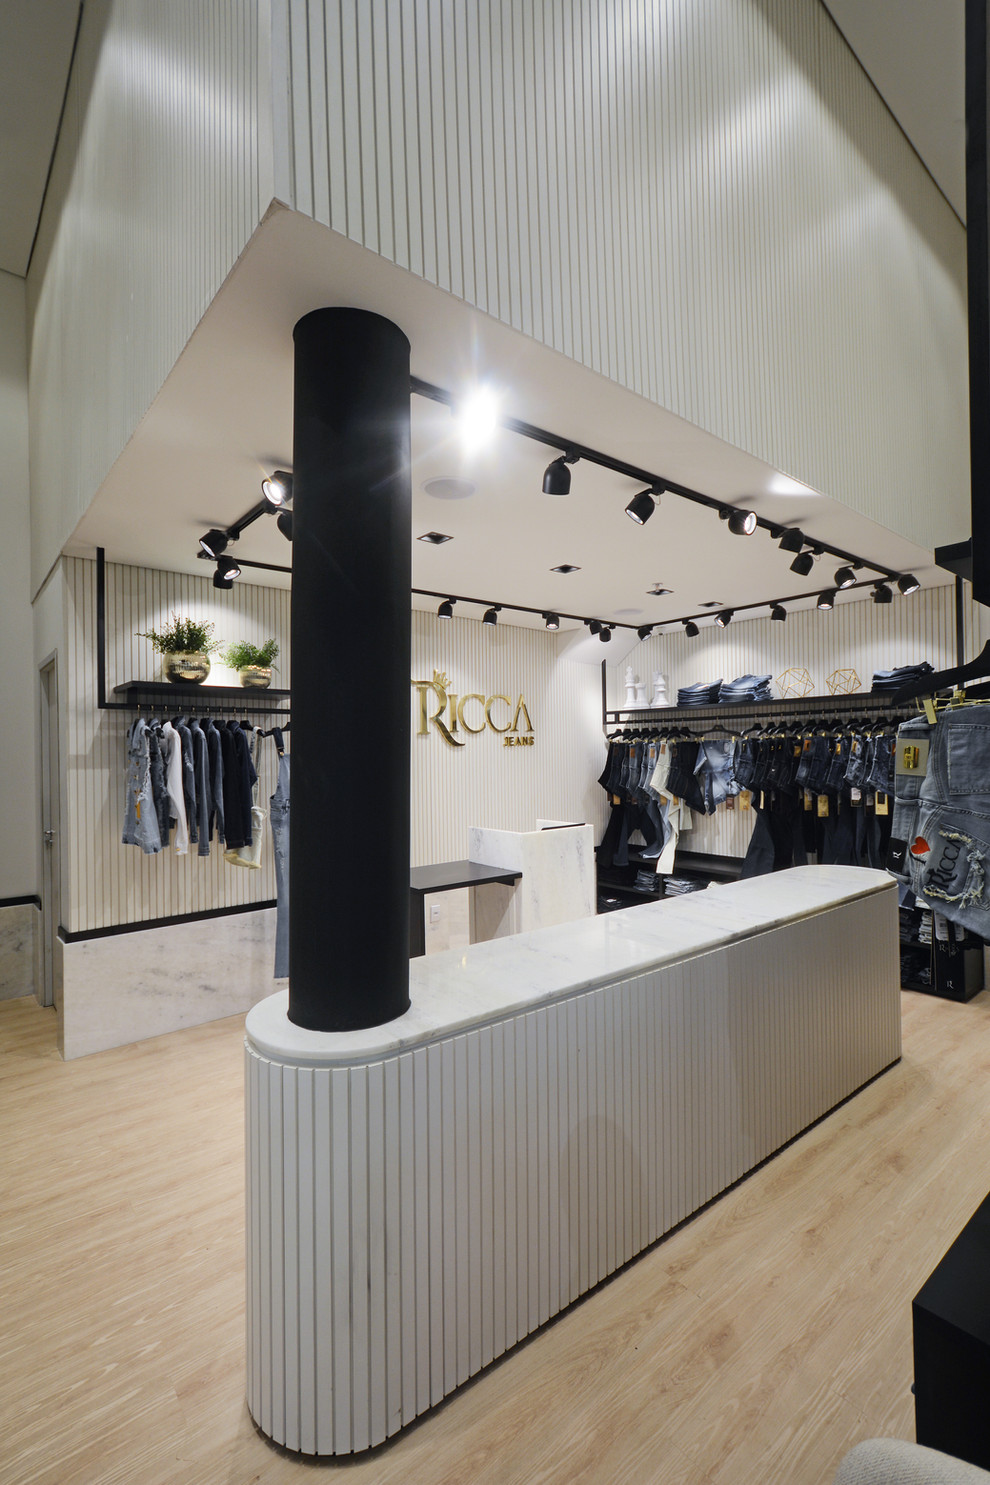 loja ricca jeans_2